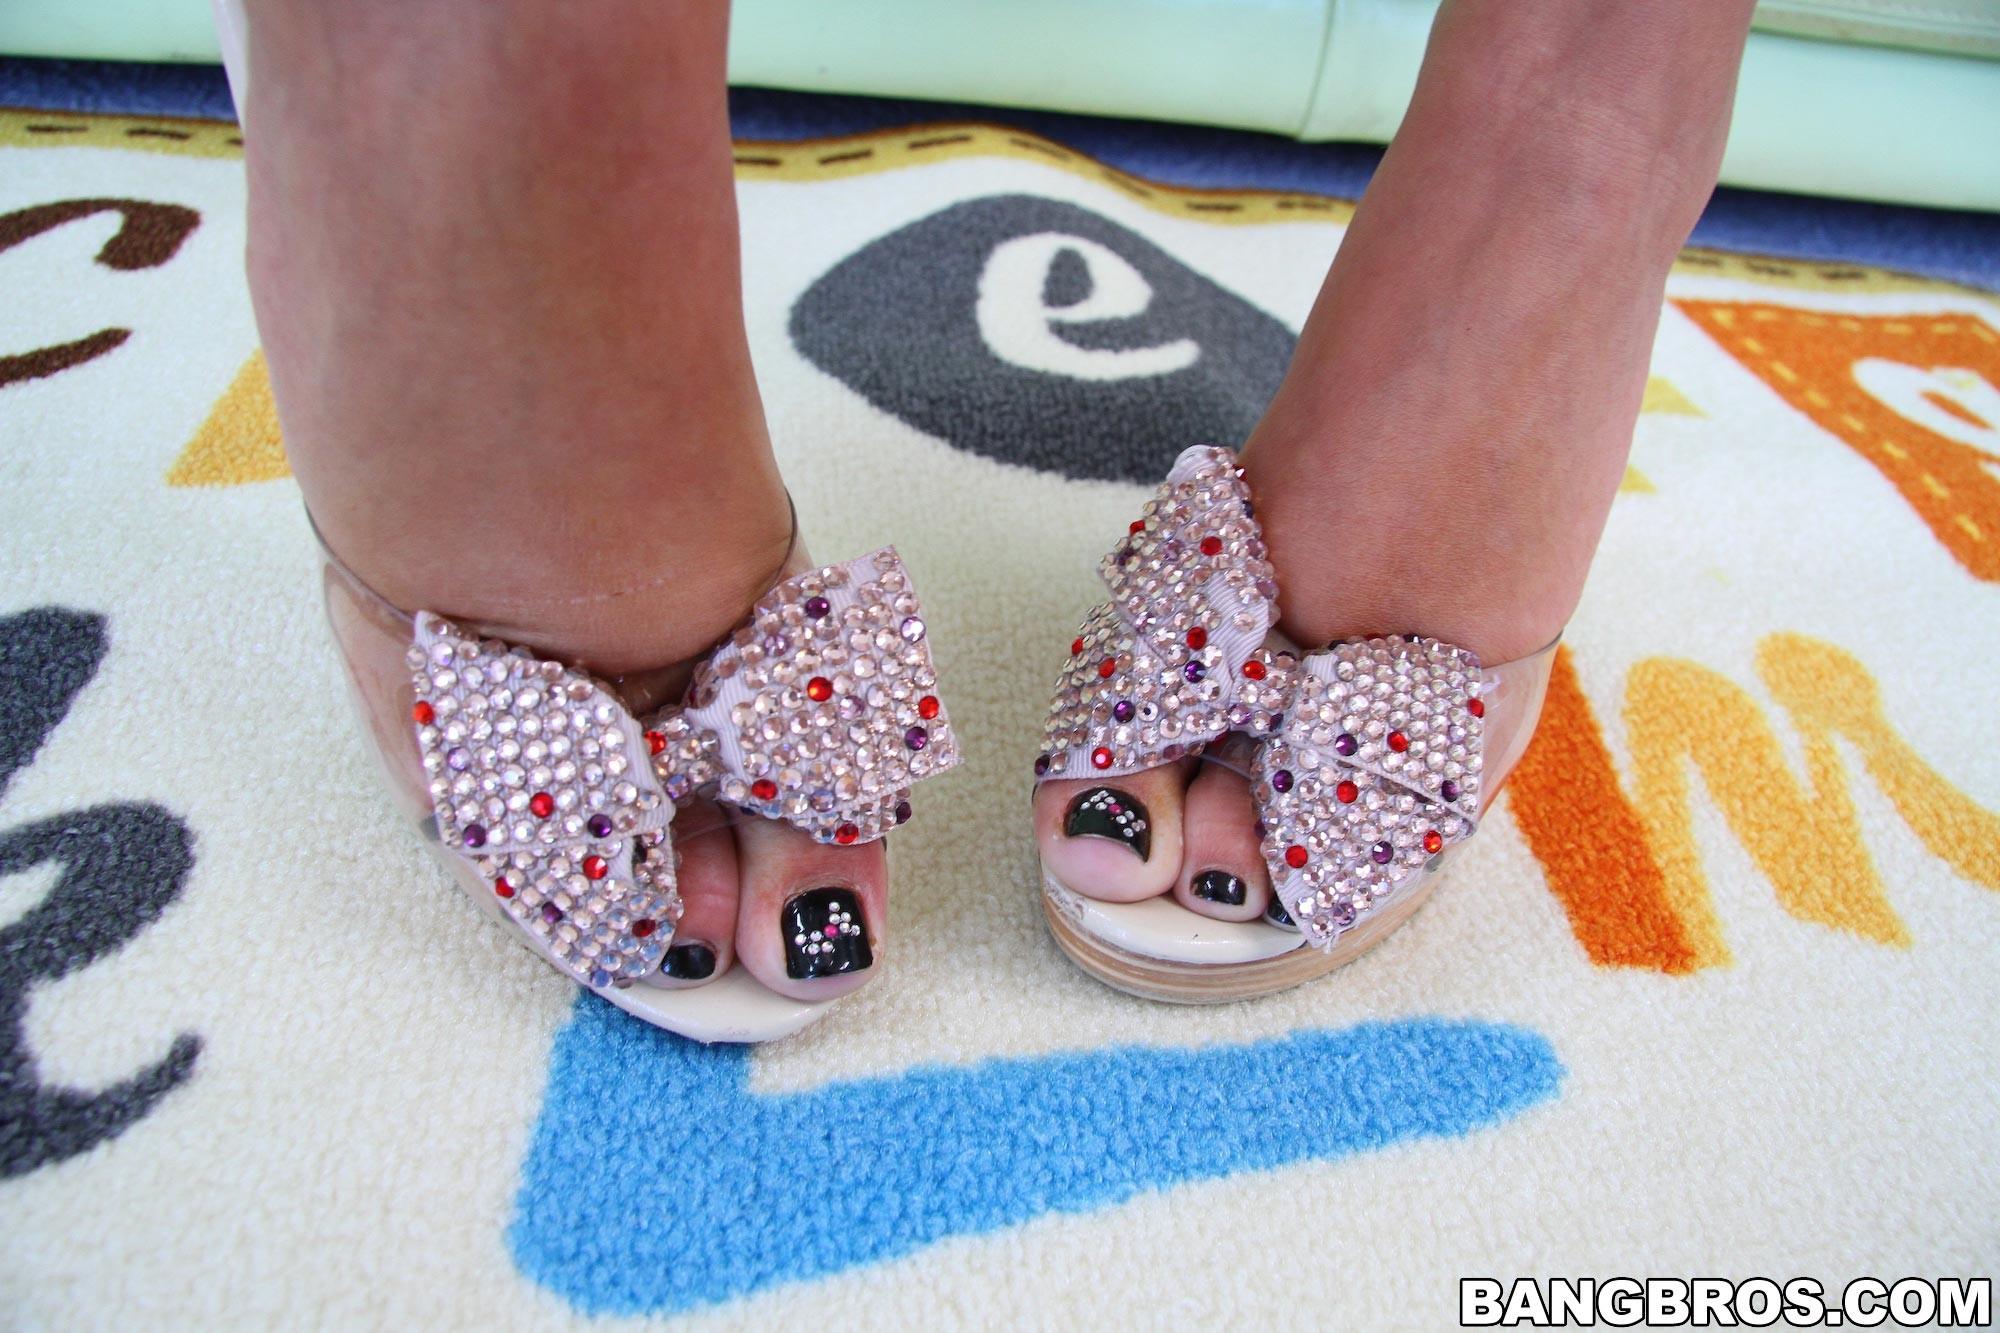 Дрочит ножками (футджоб) - Галерея № 3212309